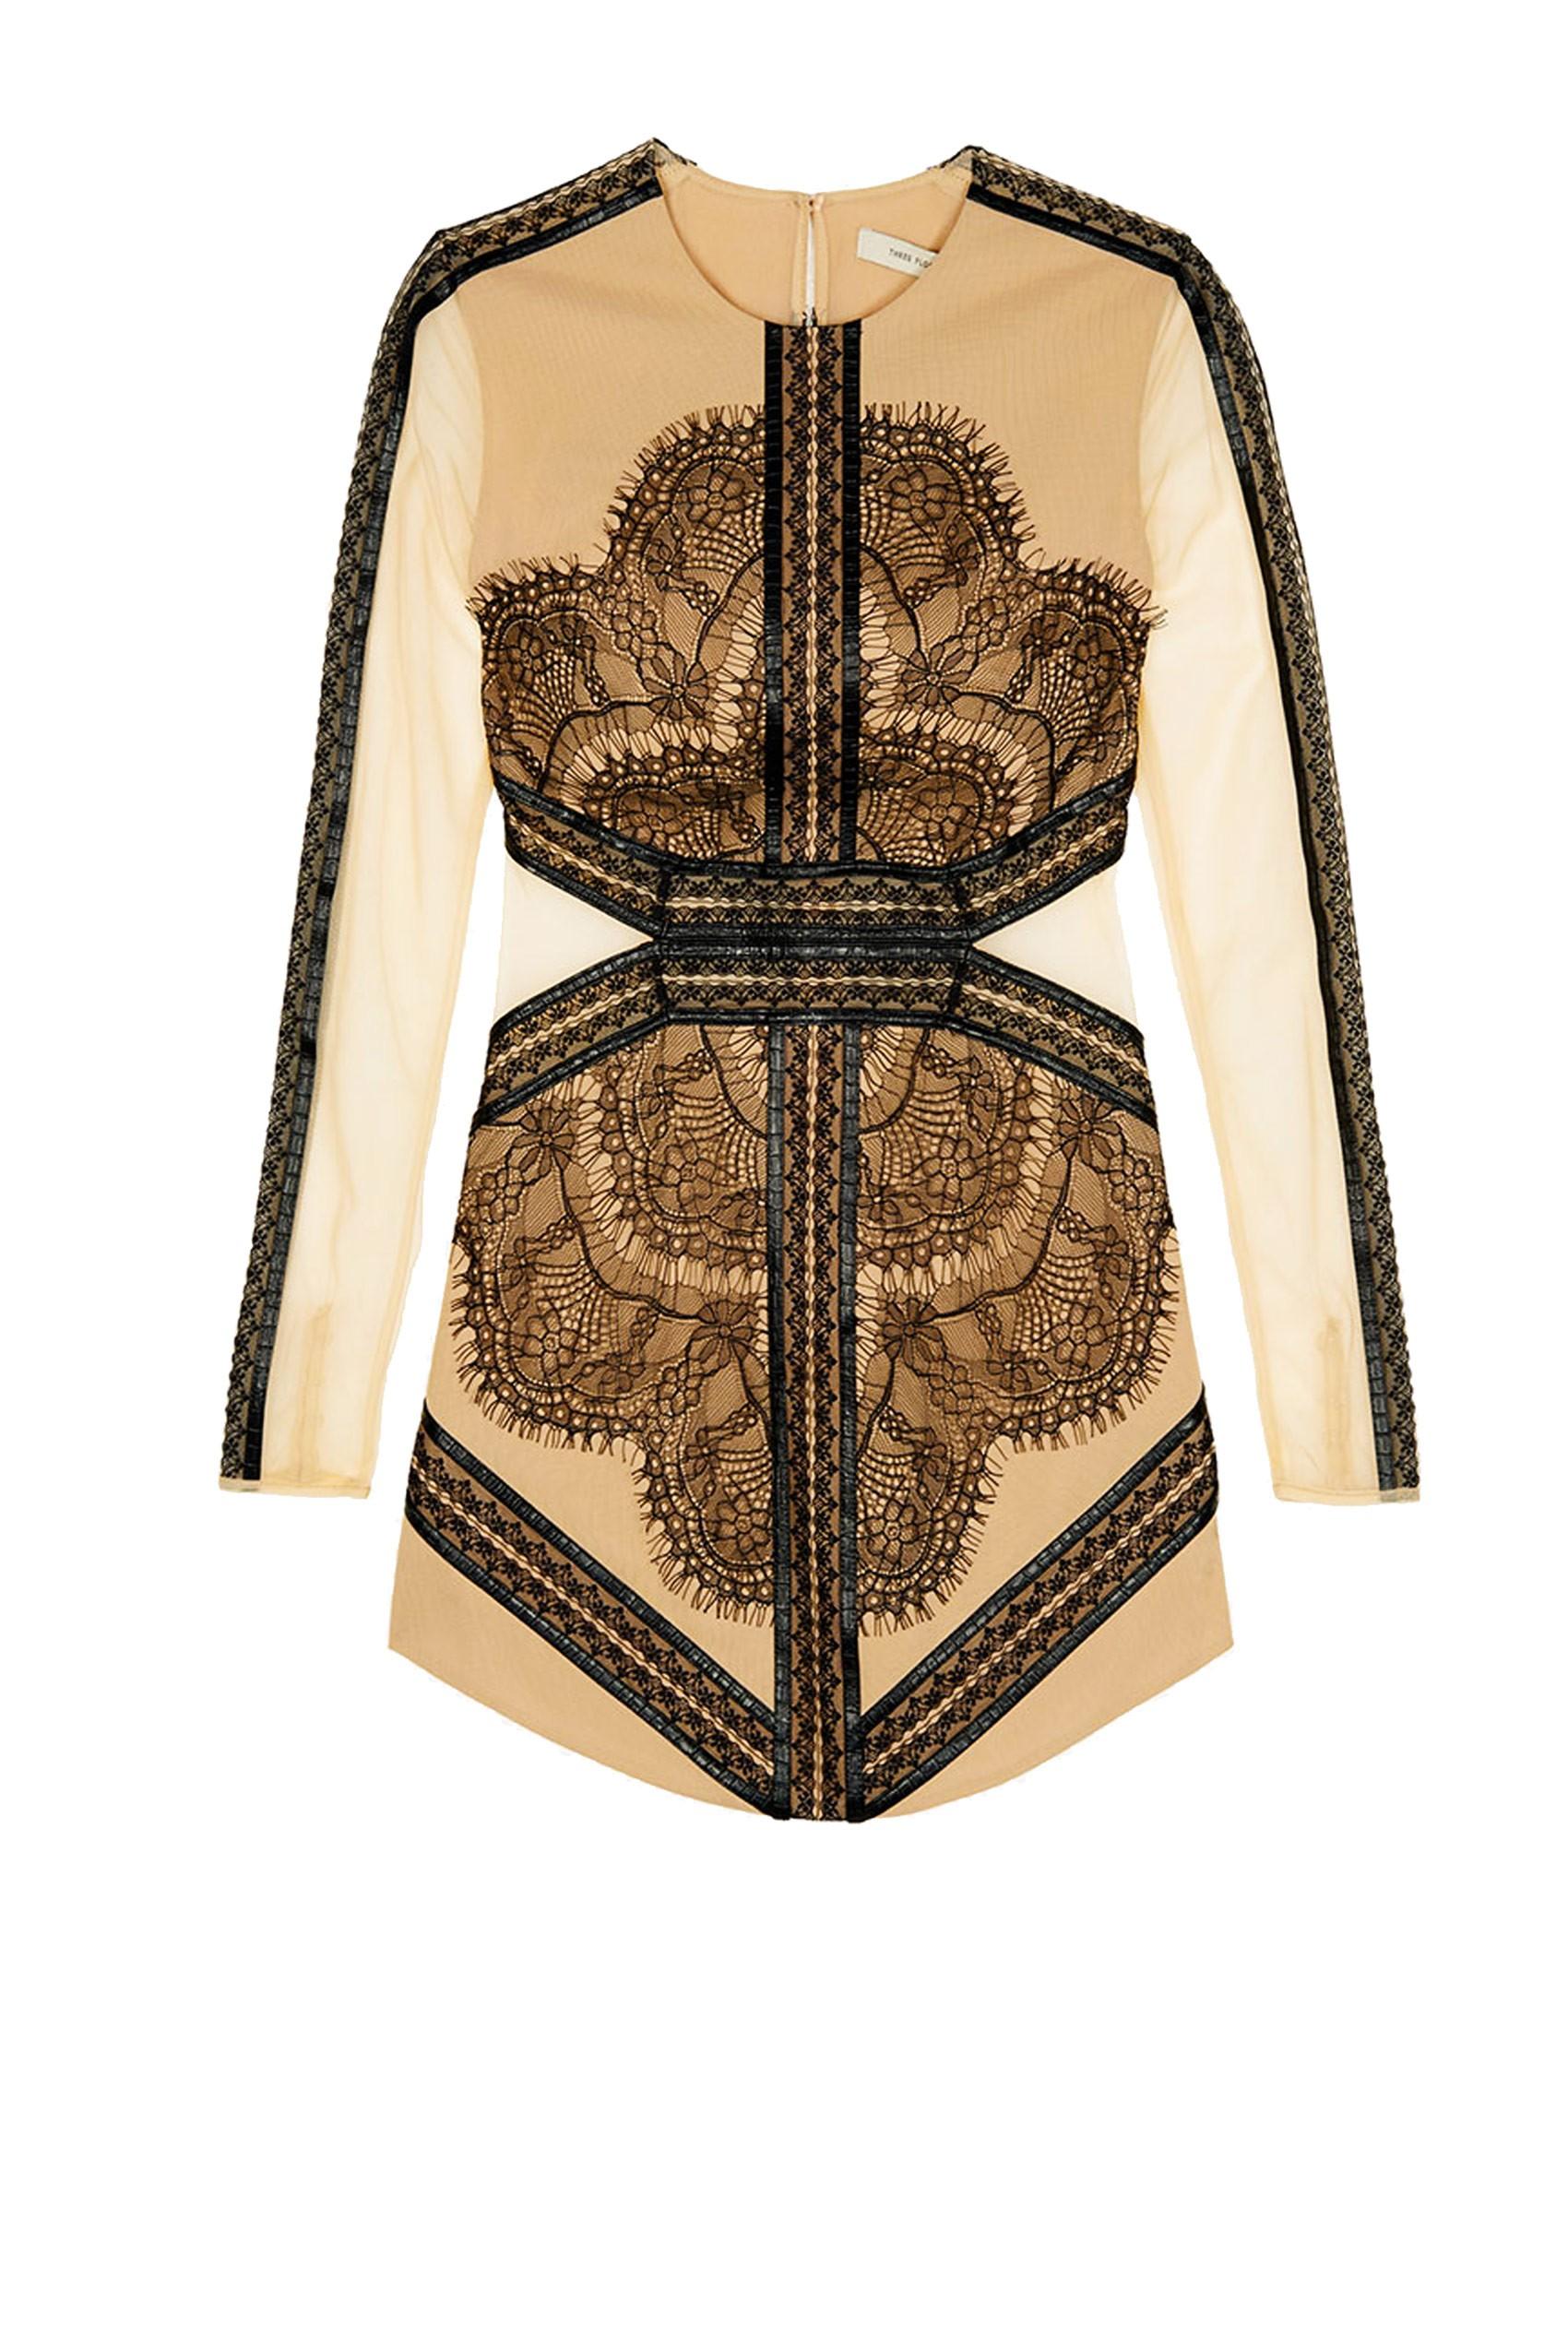 MADEMOISELLE Black Lace Dress - Styligion.com